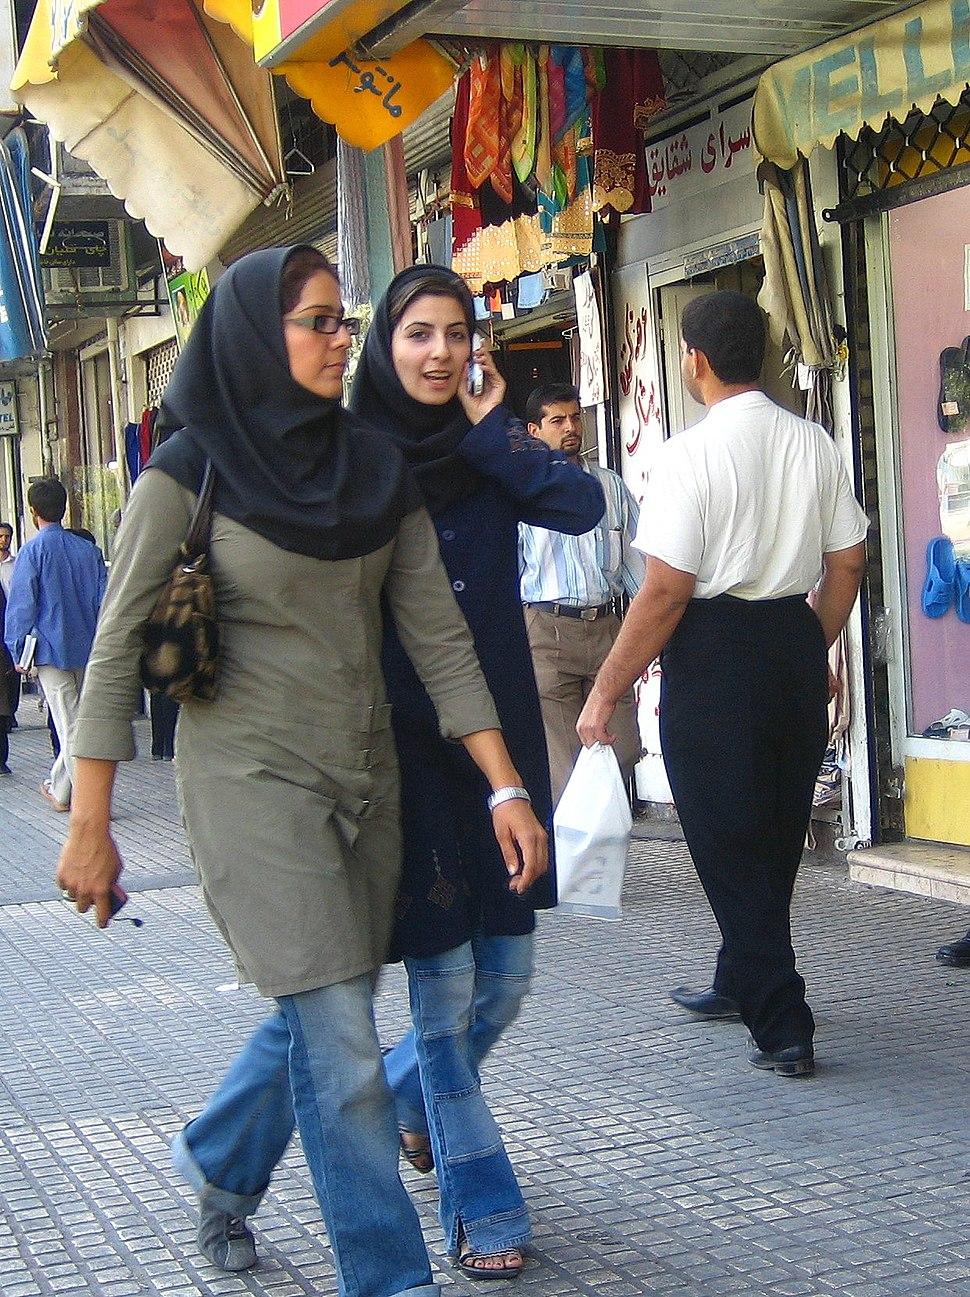 Iranian women walking and talking